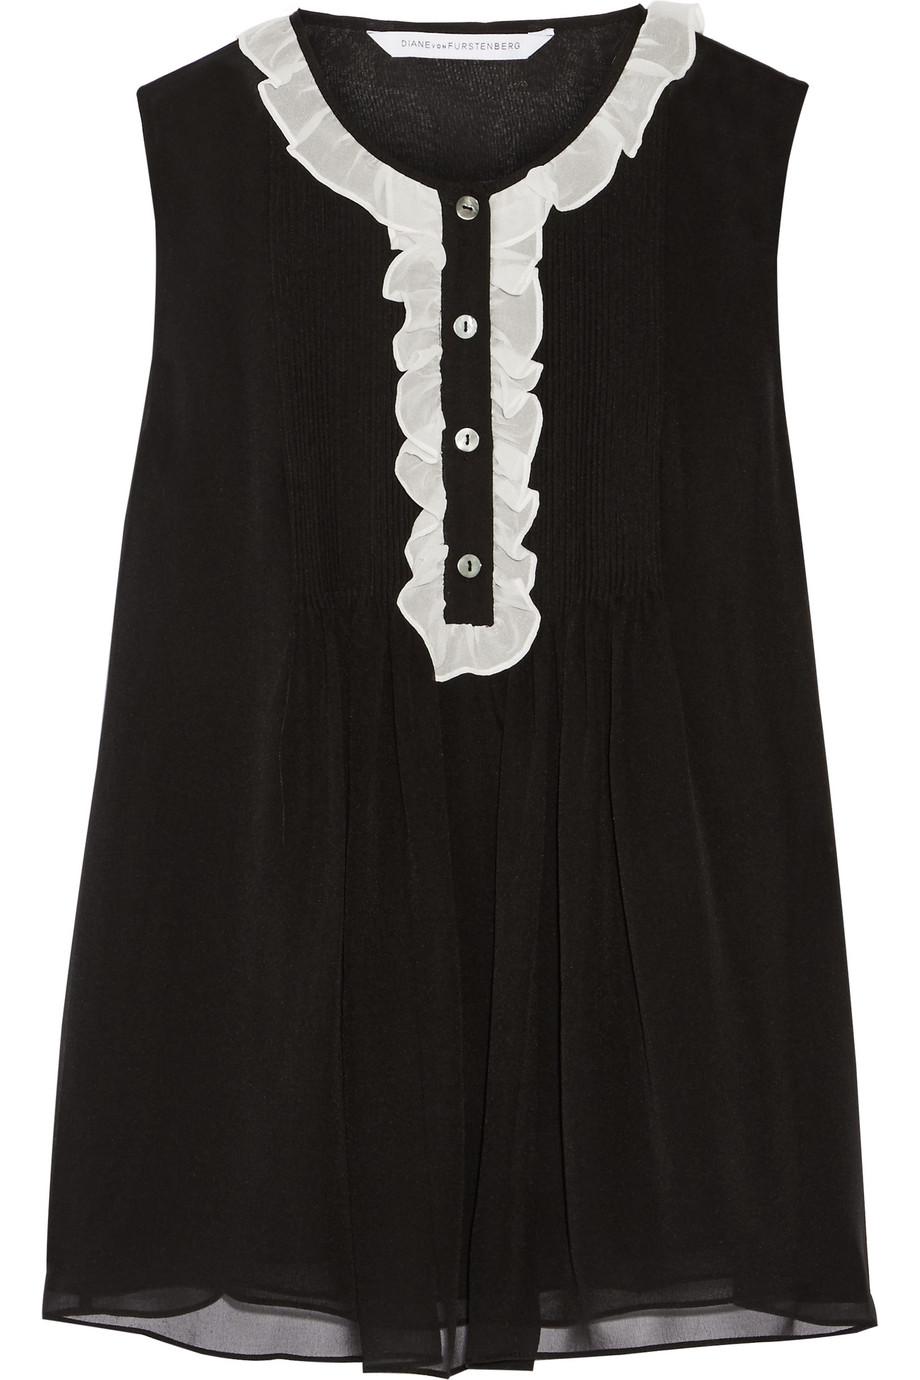 Diane Von Furstenberg Betsy Ruffled Silk-Chiffon Blouse, Black, Women's, Size: 0